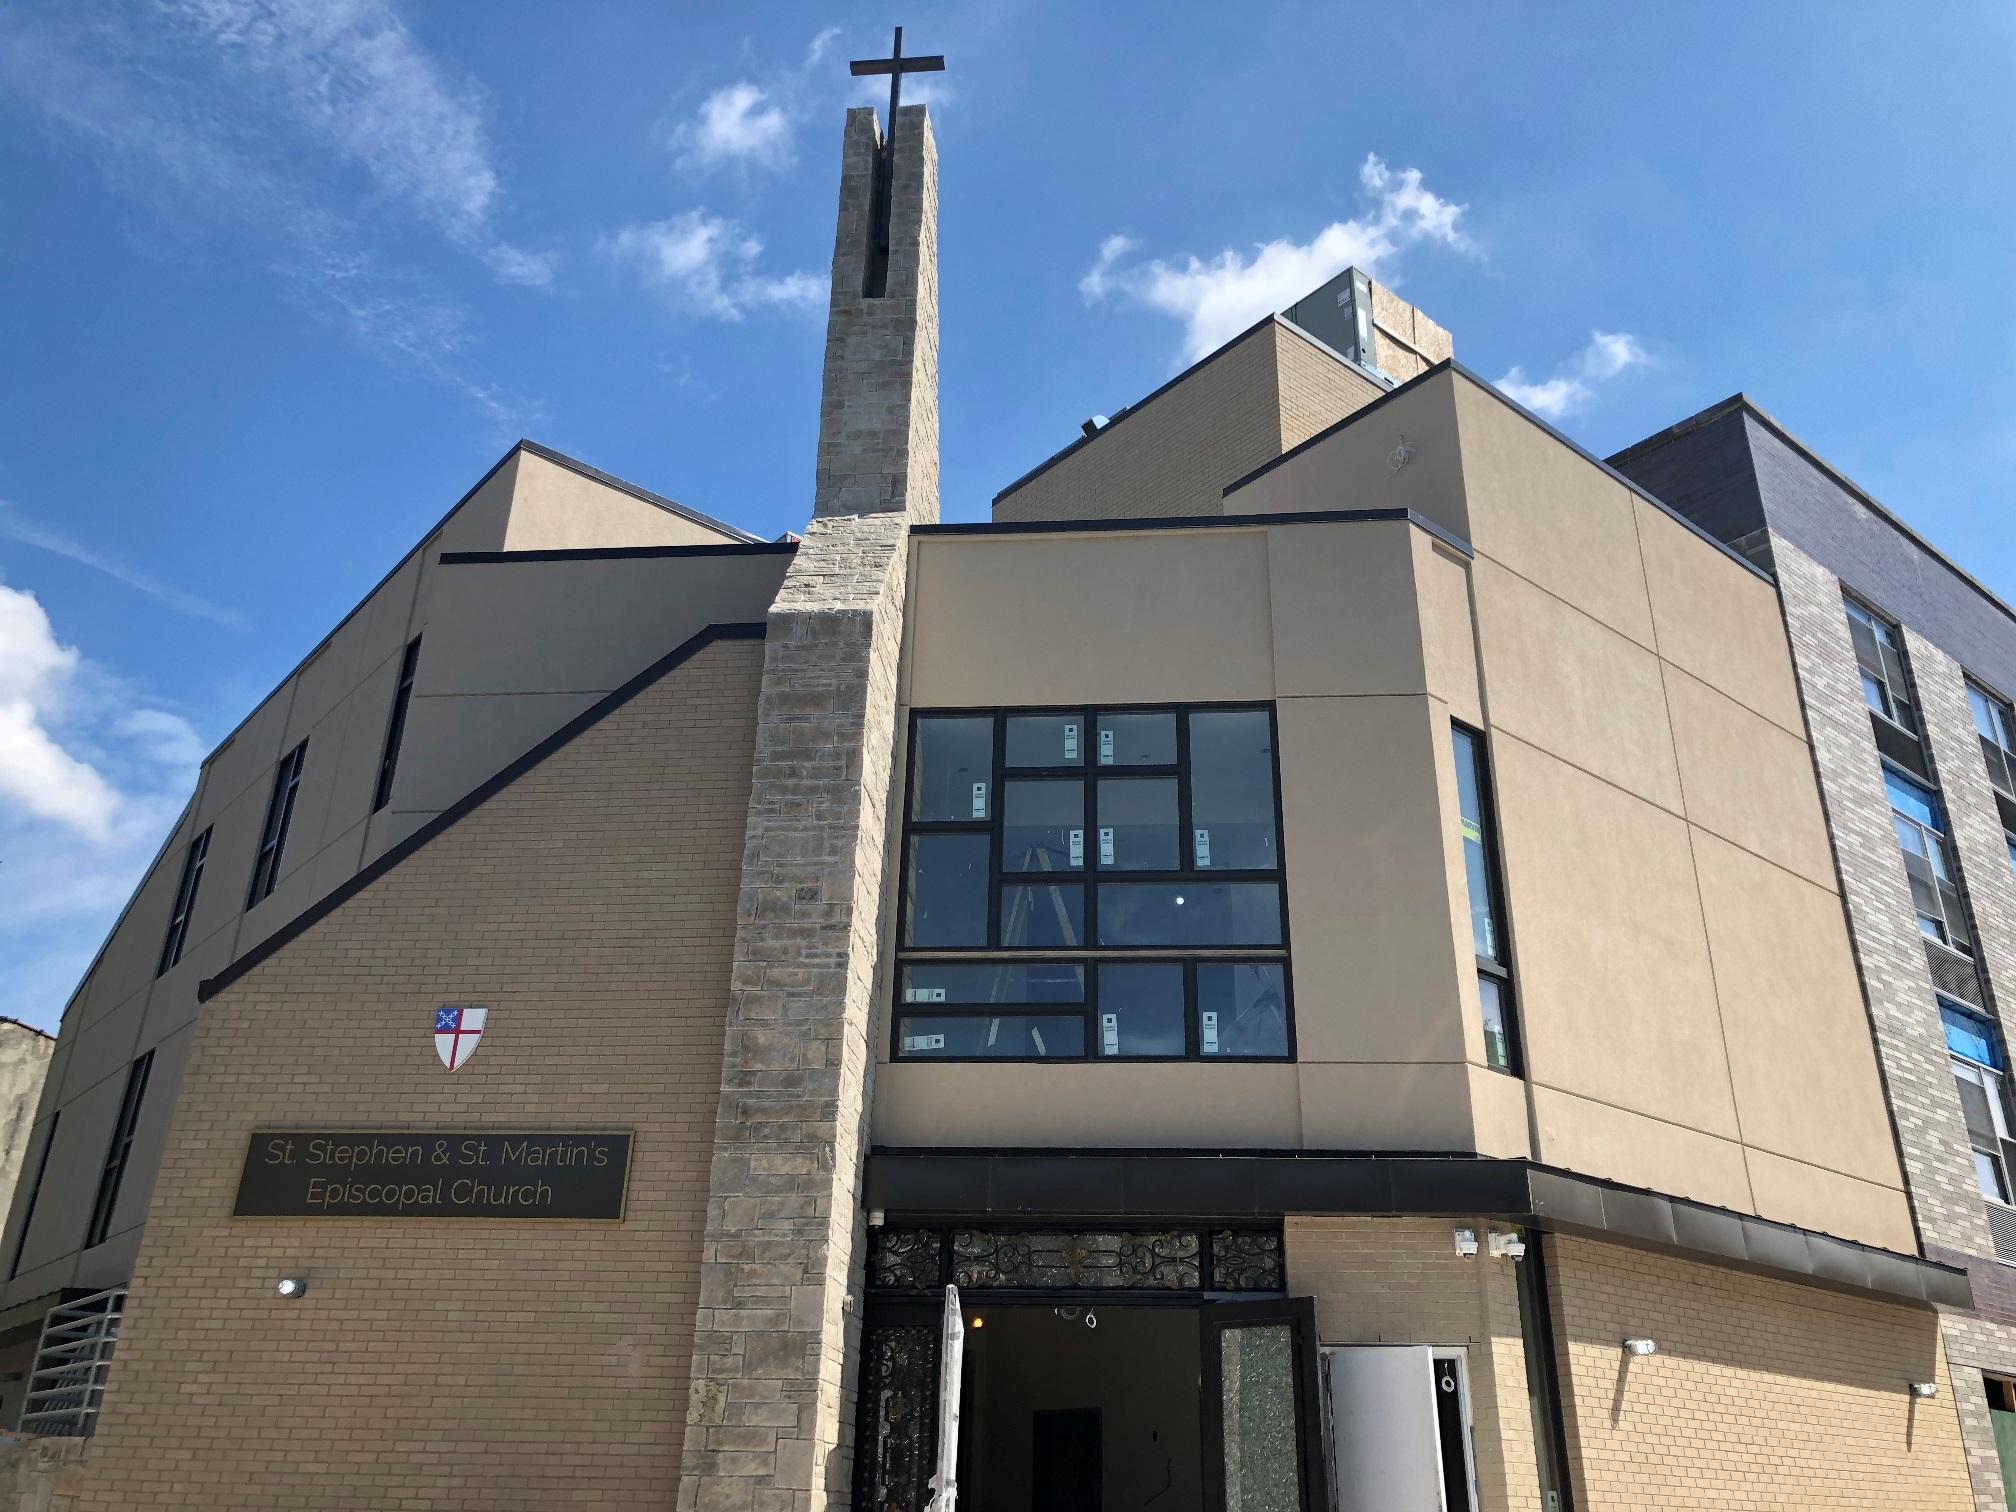 St. Stephen & St. Martin's Episcopal Church